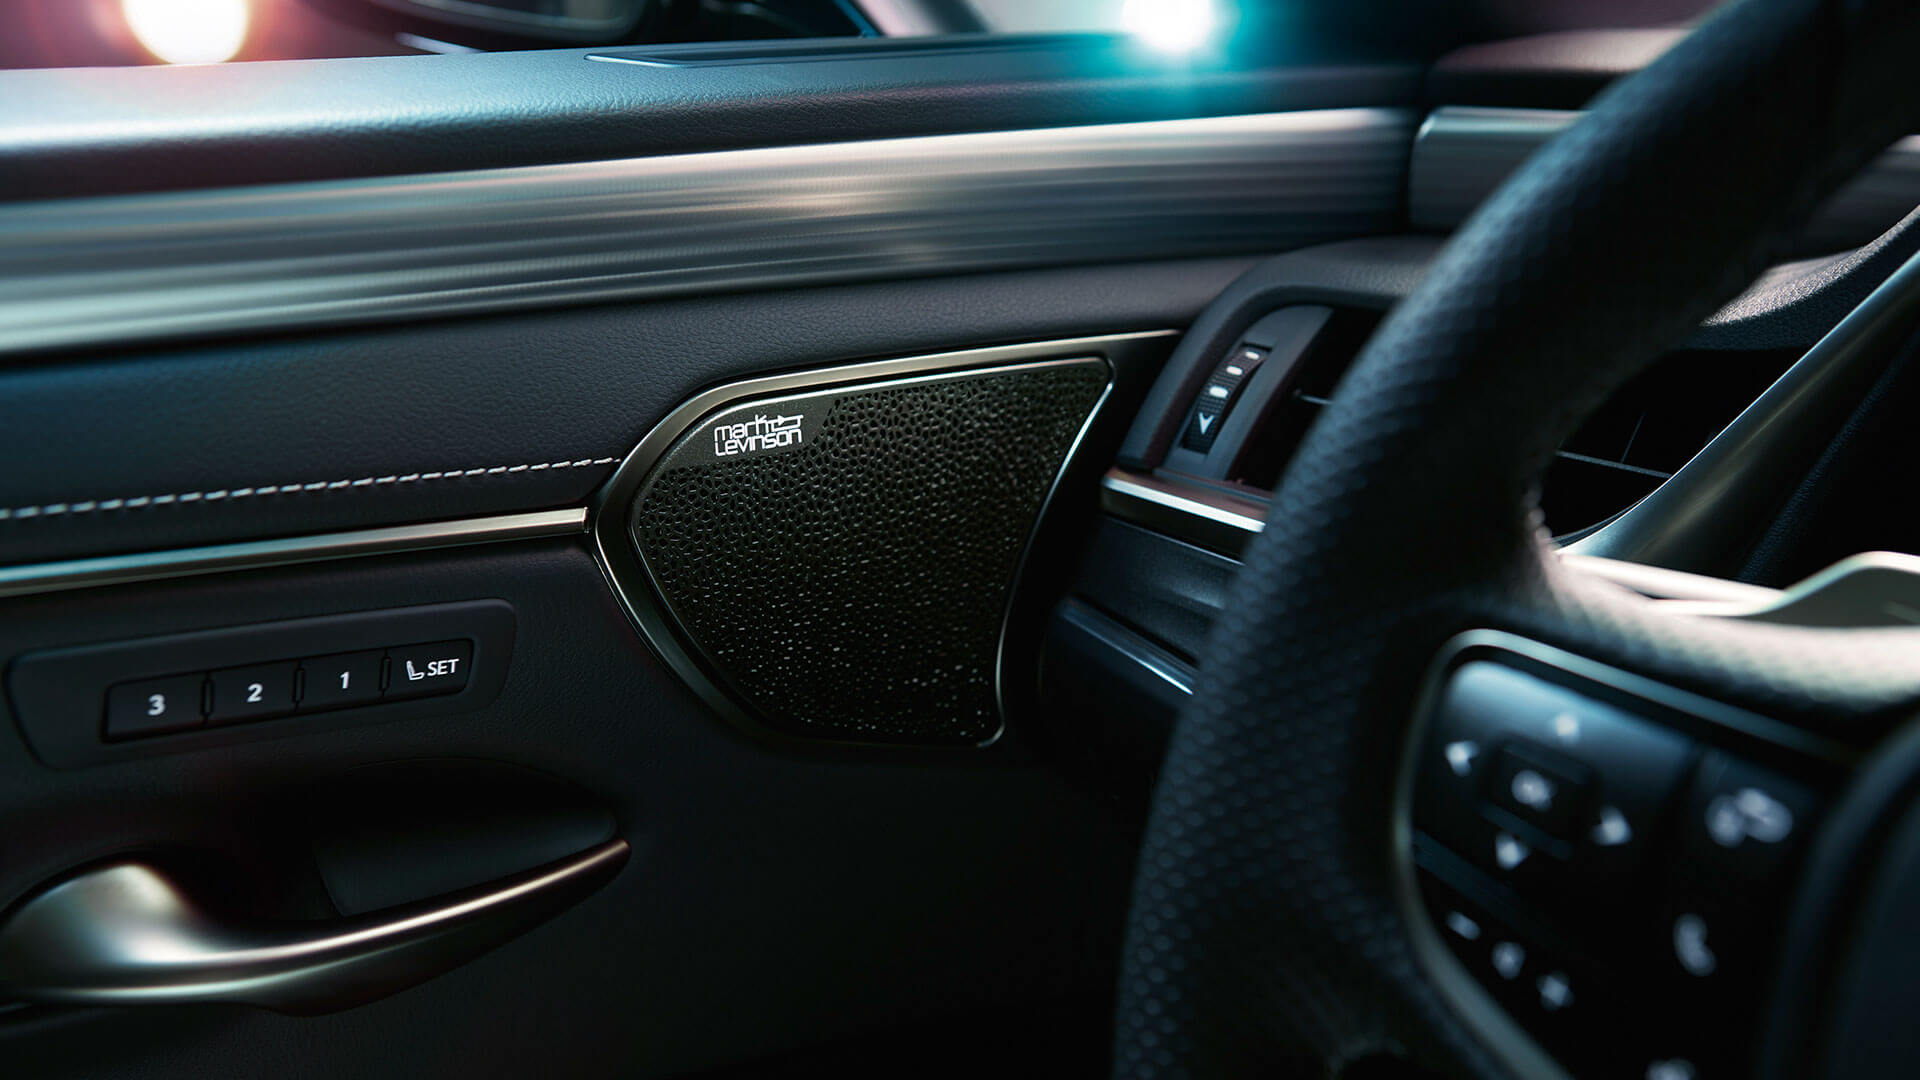 2019 Lexus Es Hybrid Gallery 007 Interior